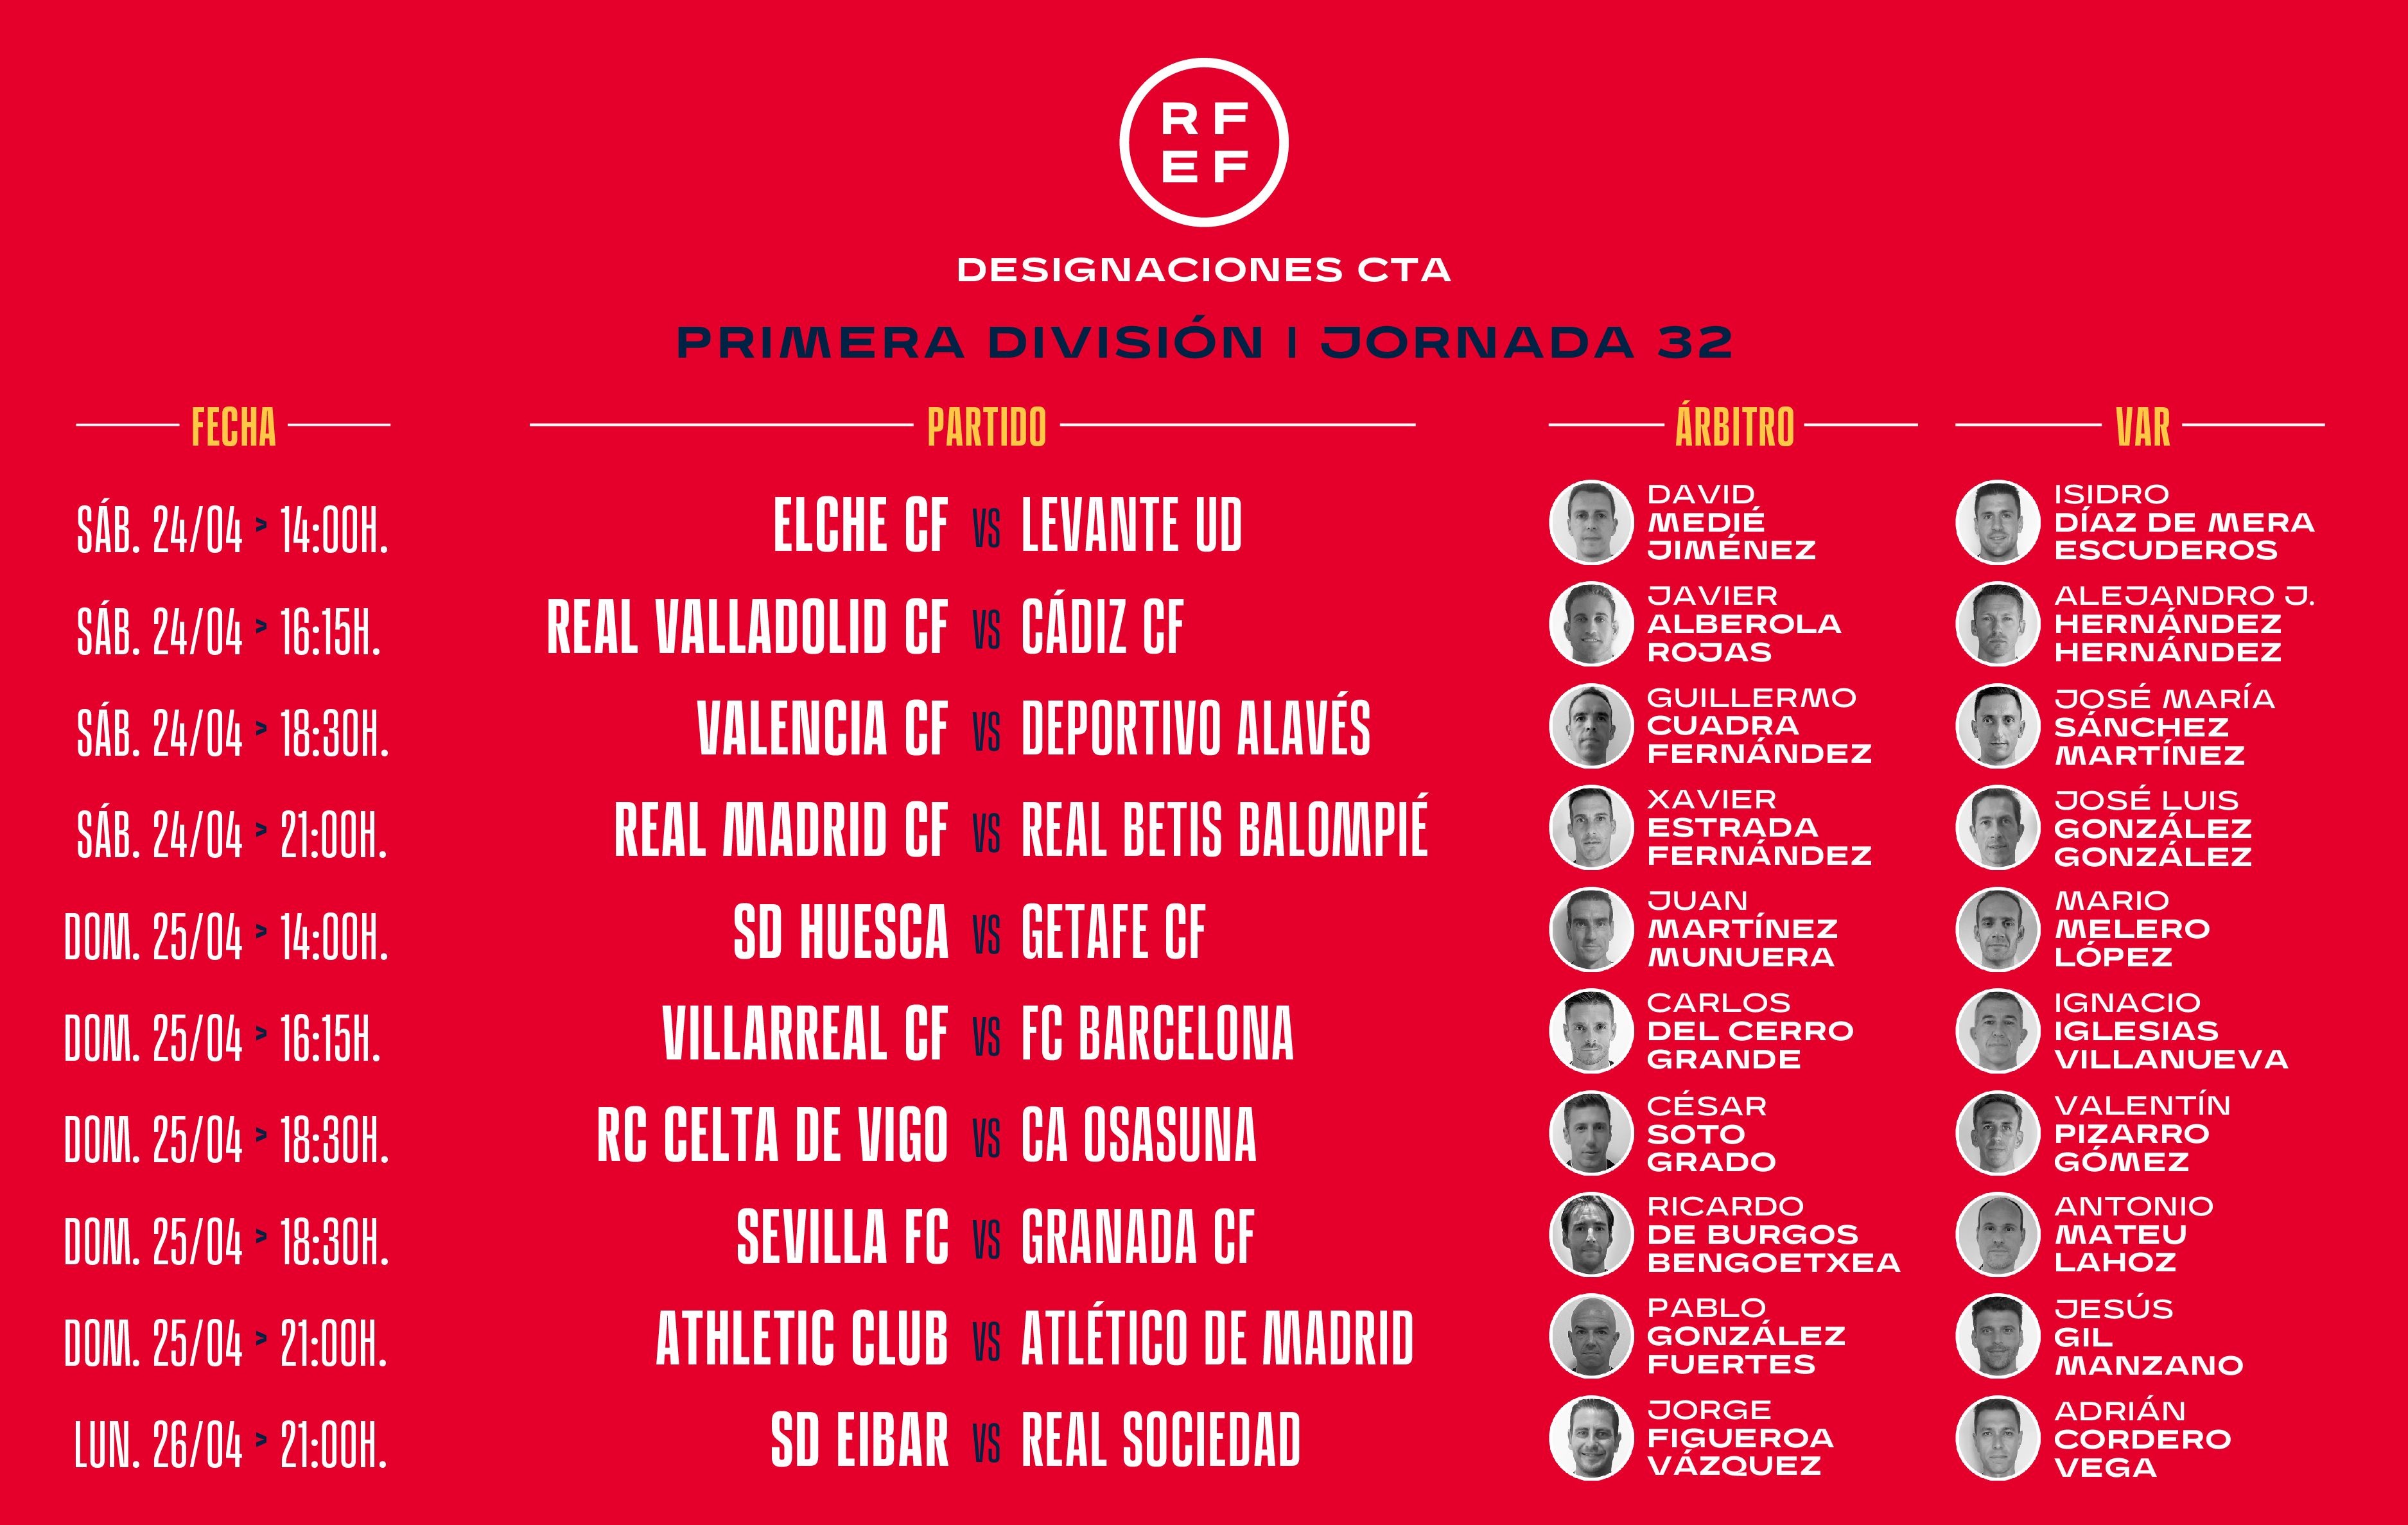 Árbitros jornada 32 de LaLiga Santander.